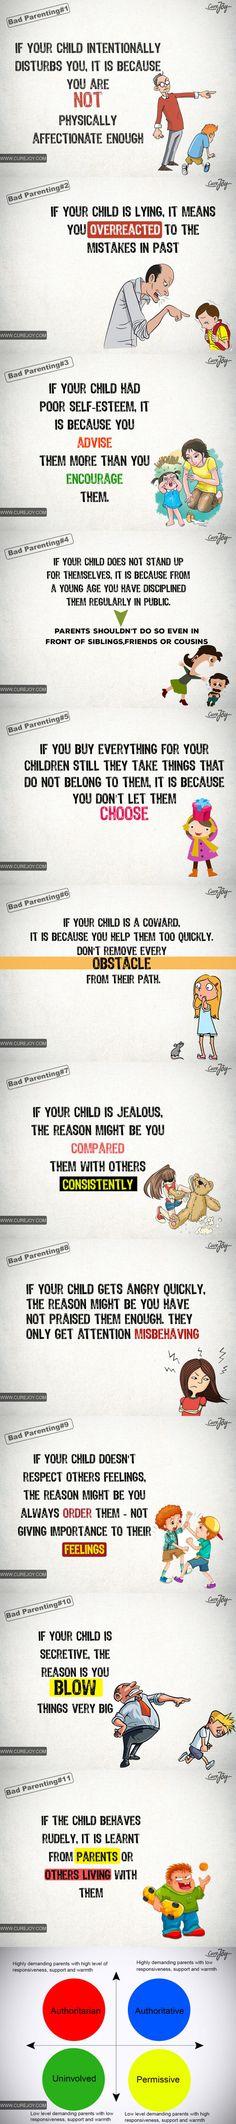 Found parents some advice, trust me I'm a psychologist - Imgur